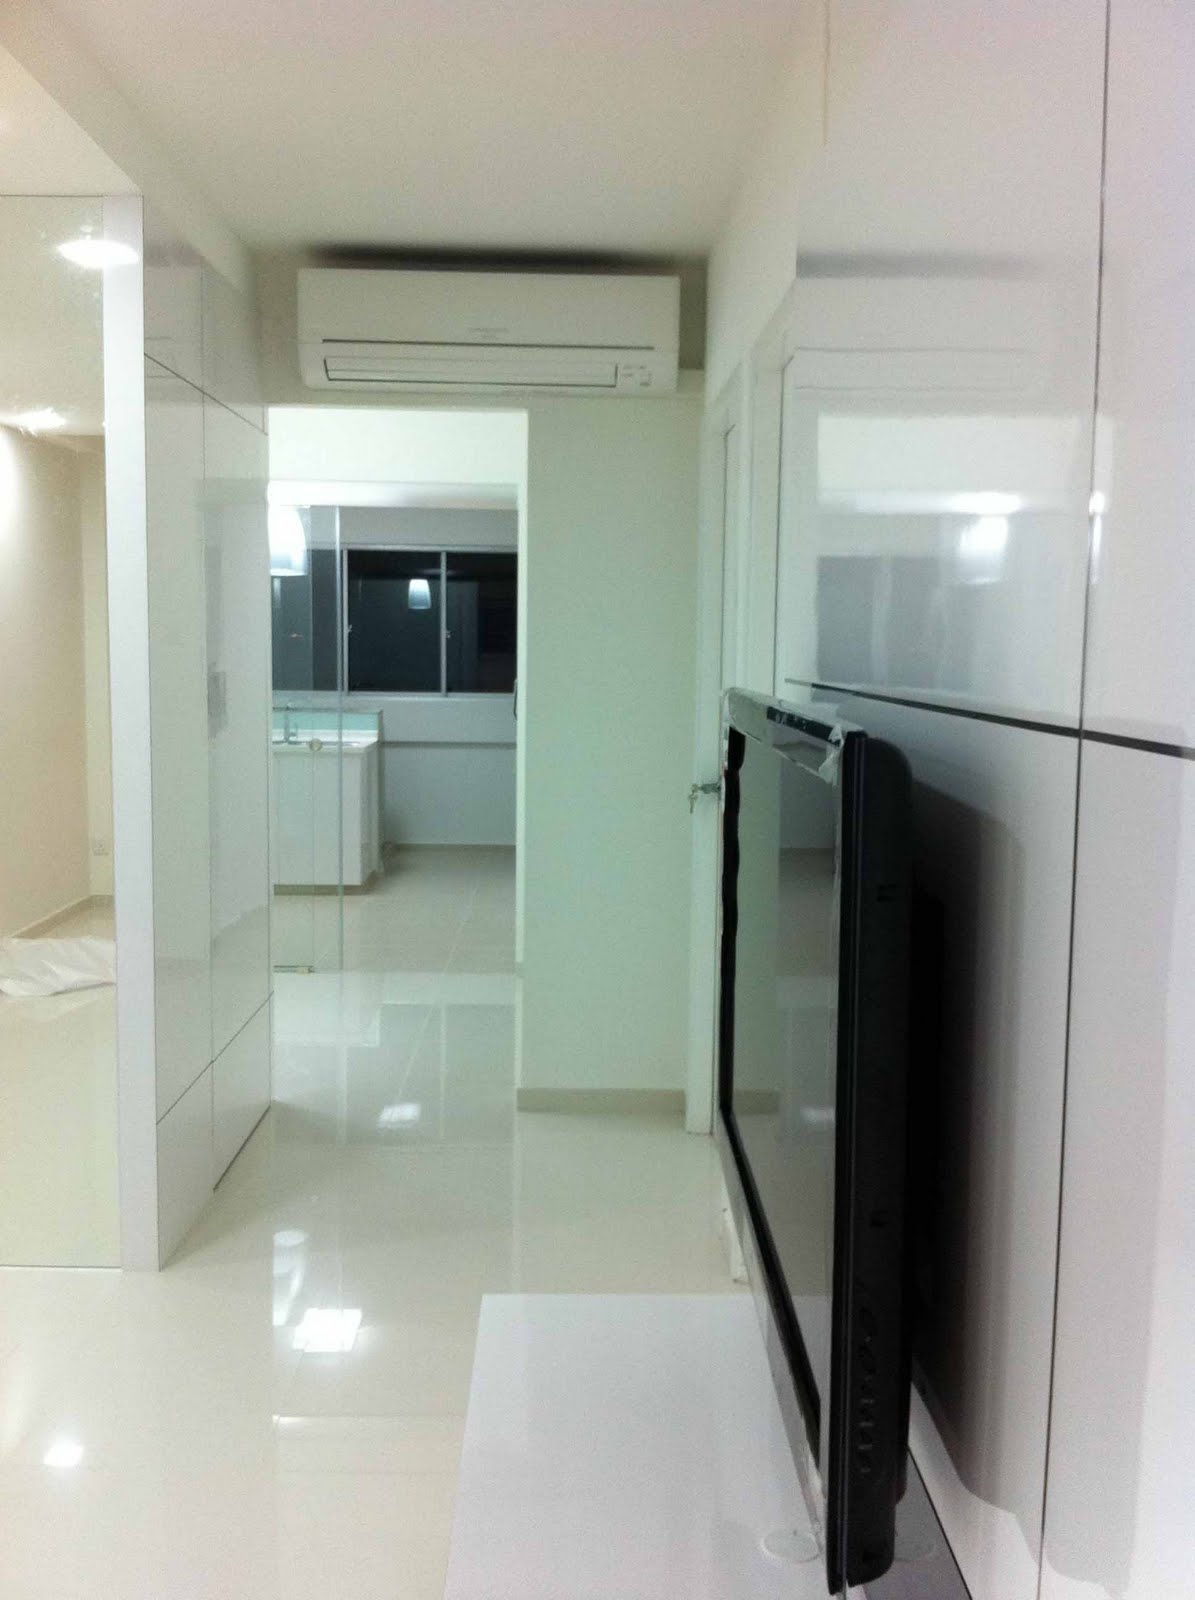 Telecommunication Room Design: Home Designers Pro: Juni 2012